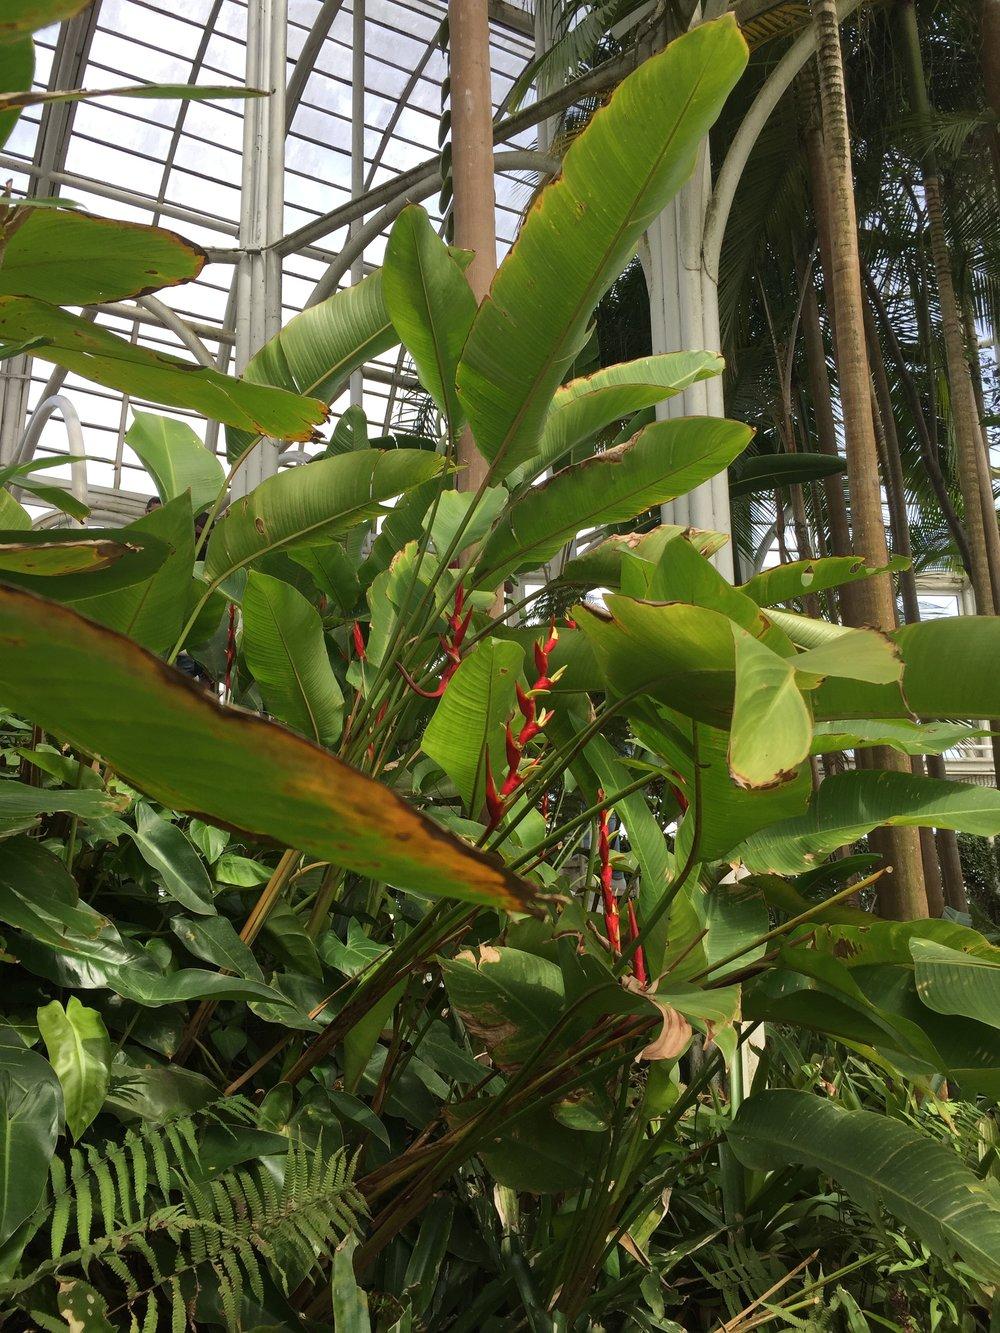 Jardim Botanico_green house